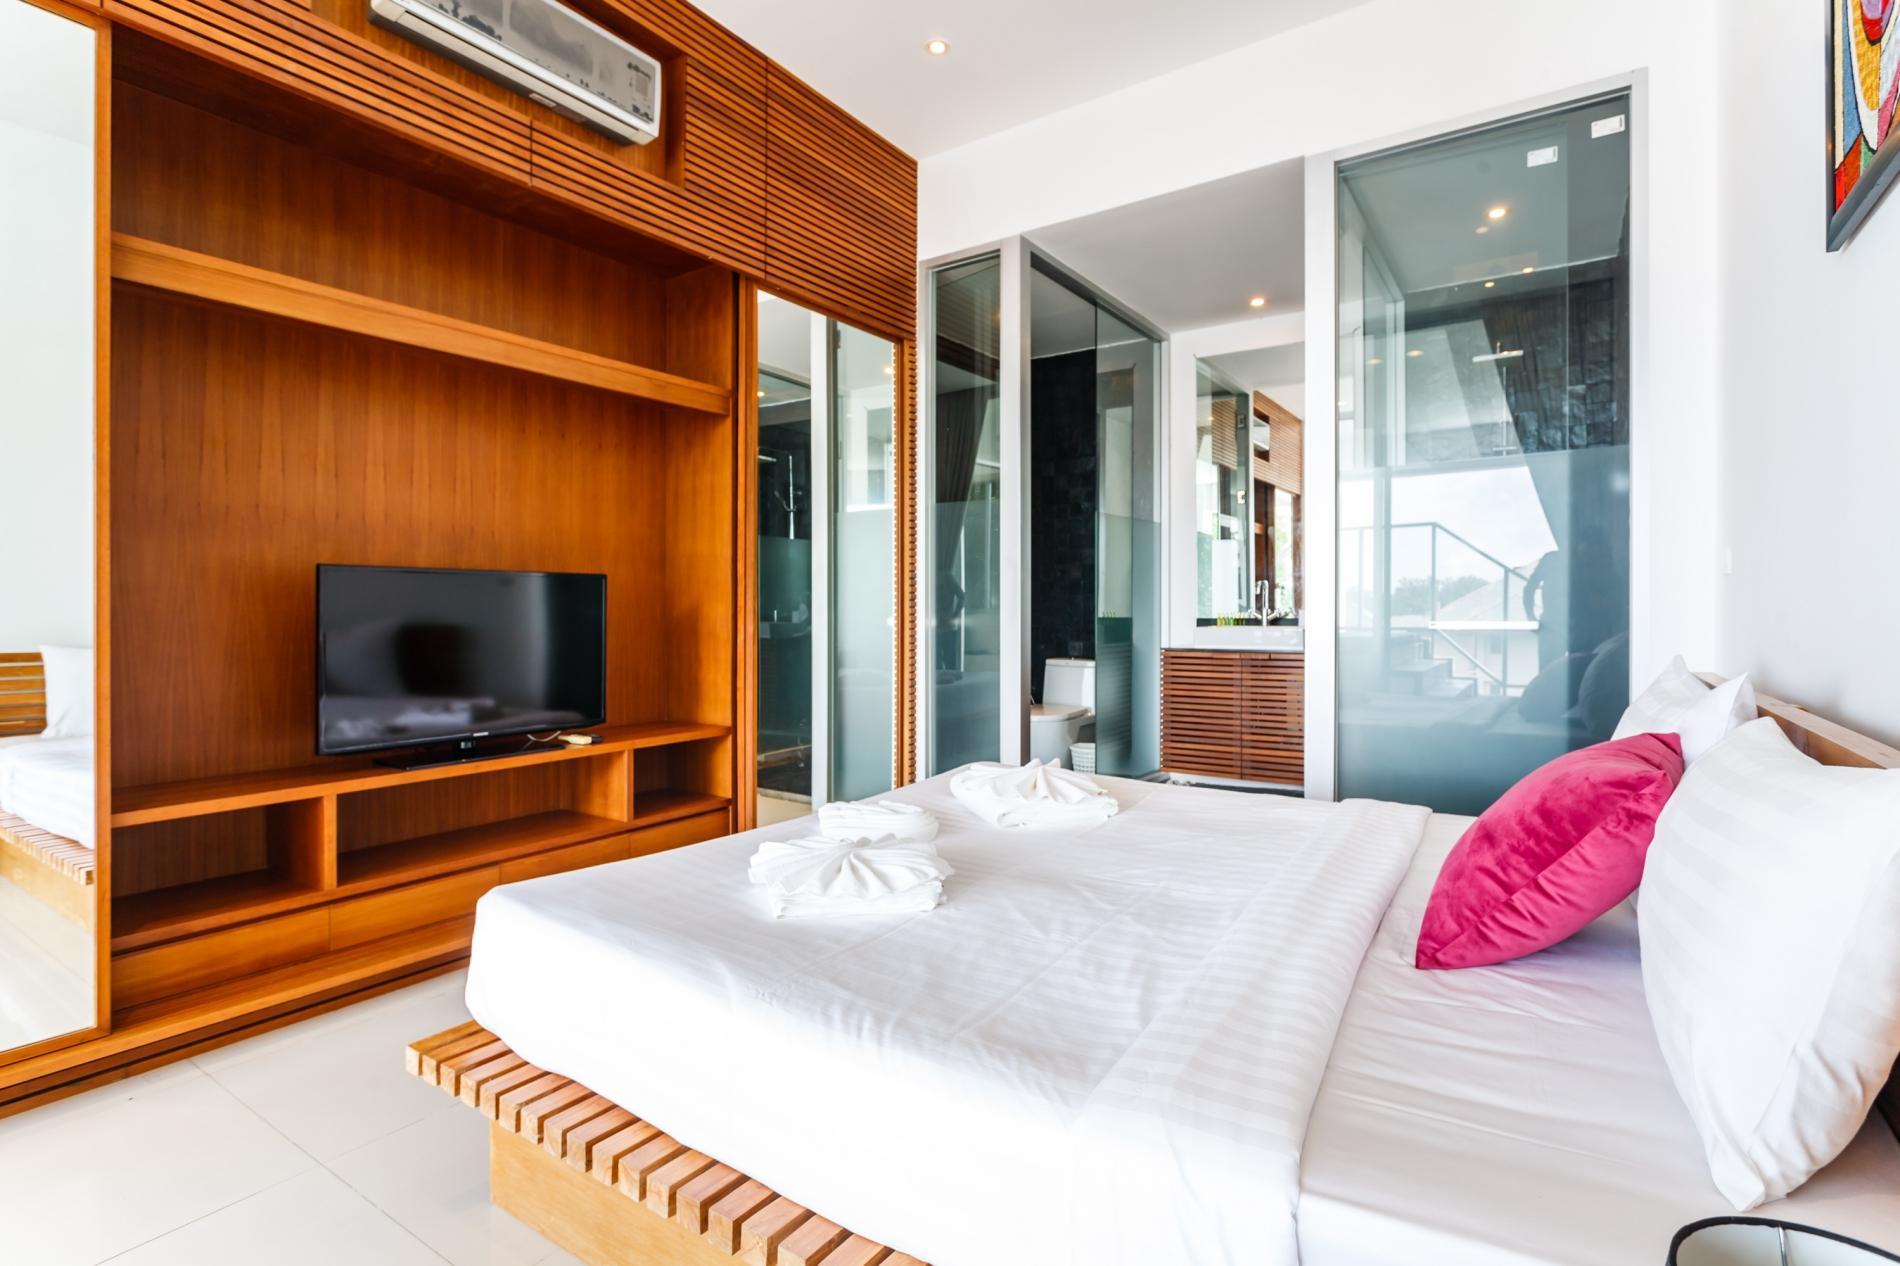 Apartment The Quarter 301 - Luxury Surin 3 bedroom apartment private pool photo 20401874